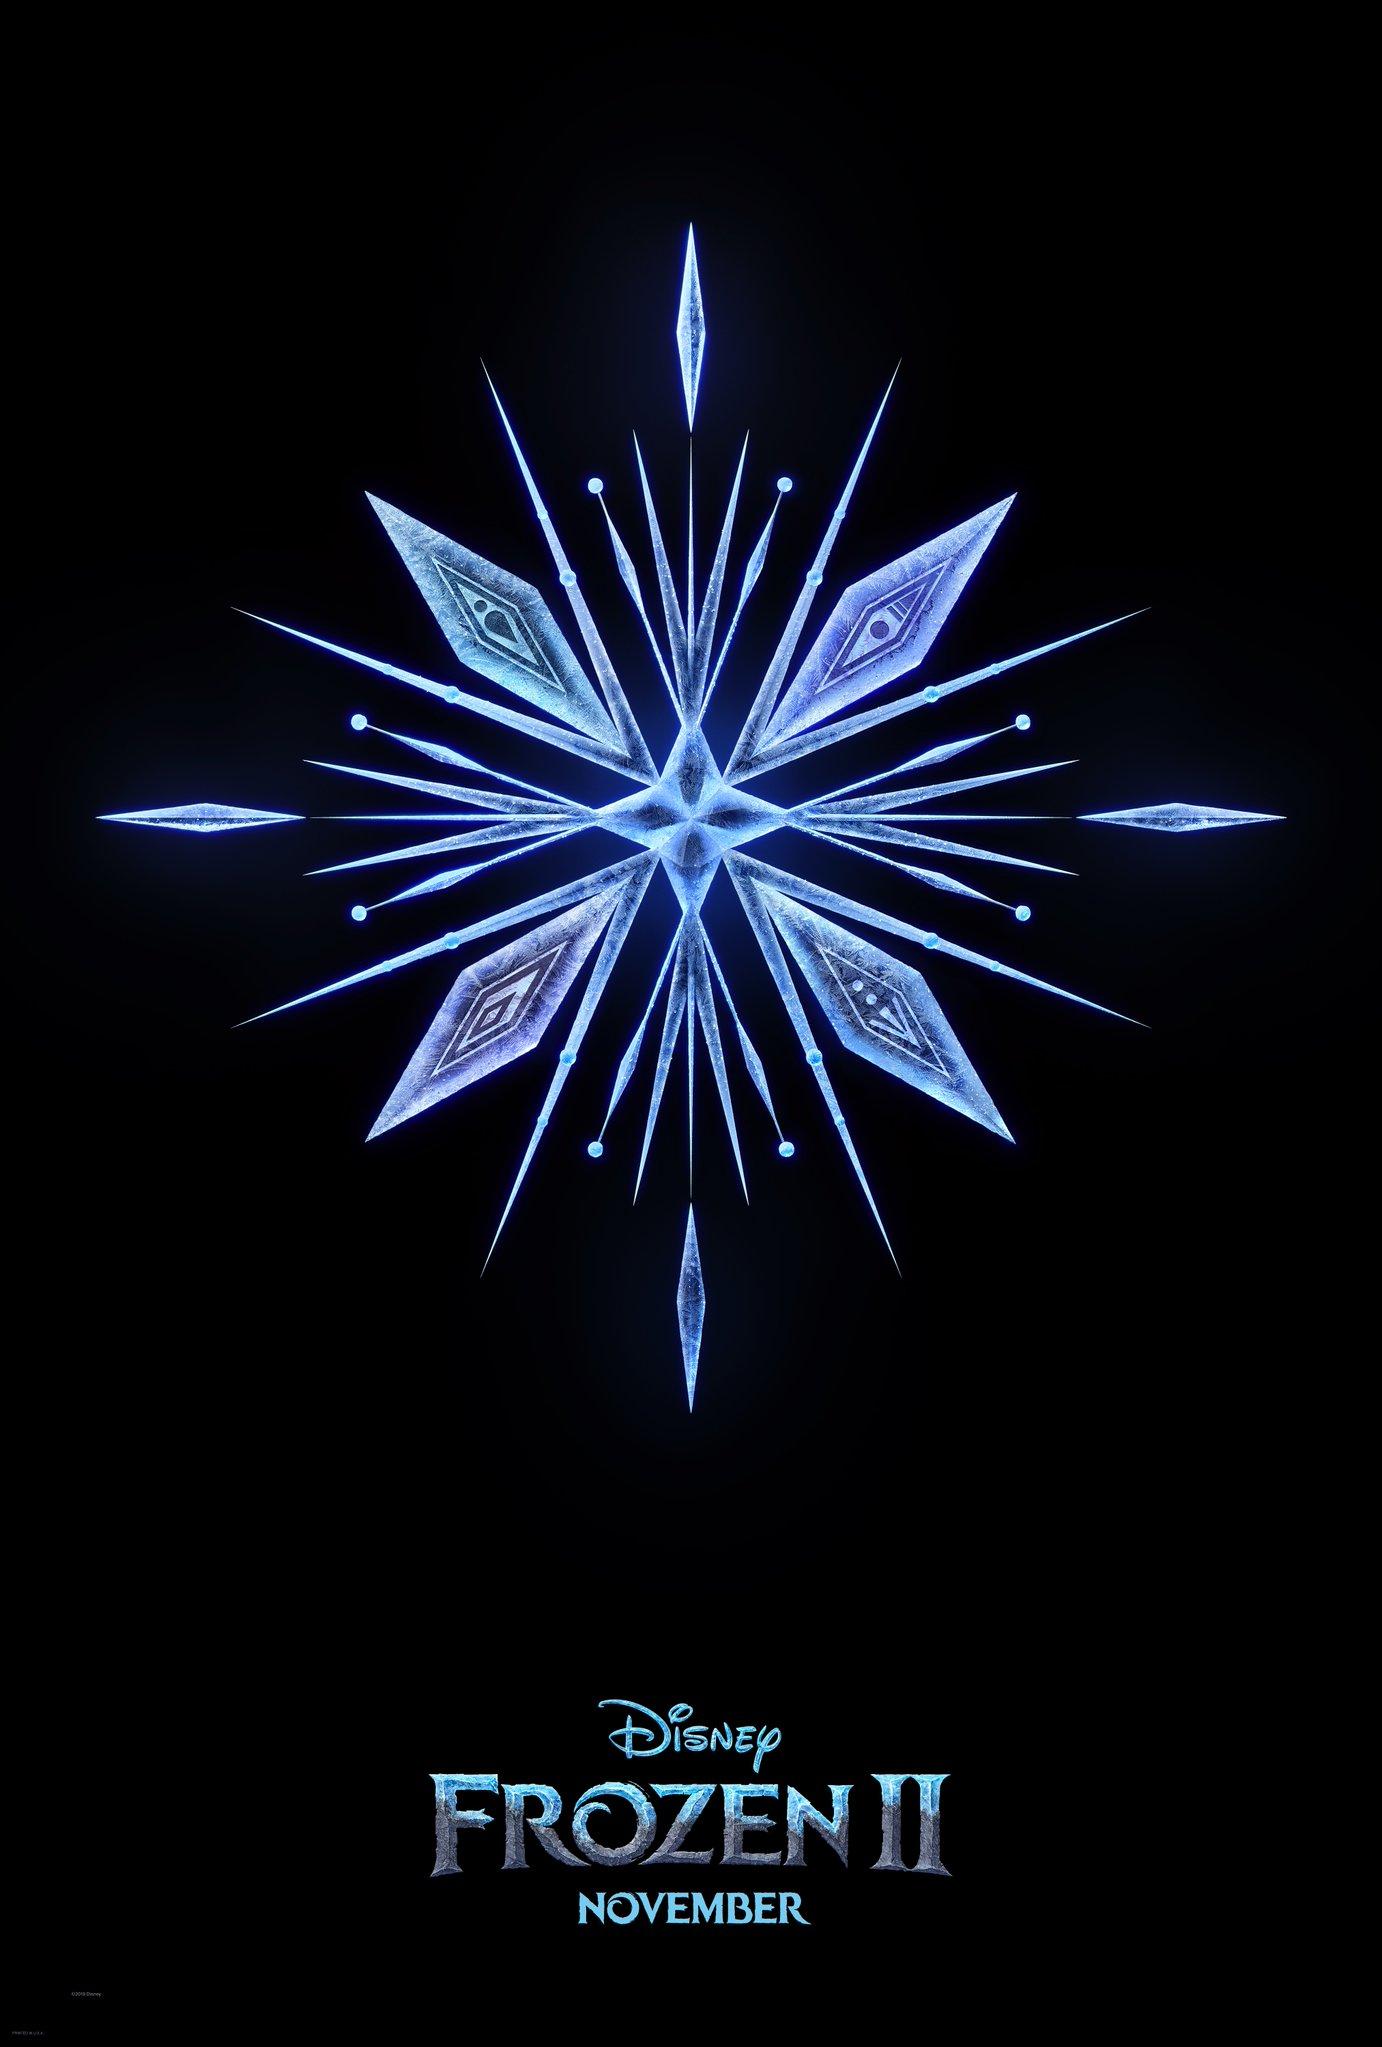 Frozen 2/Galeria